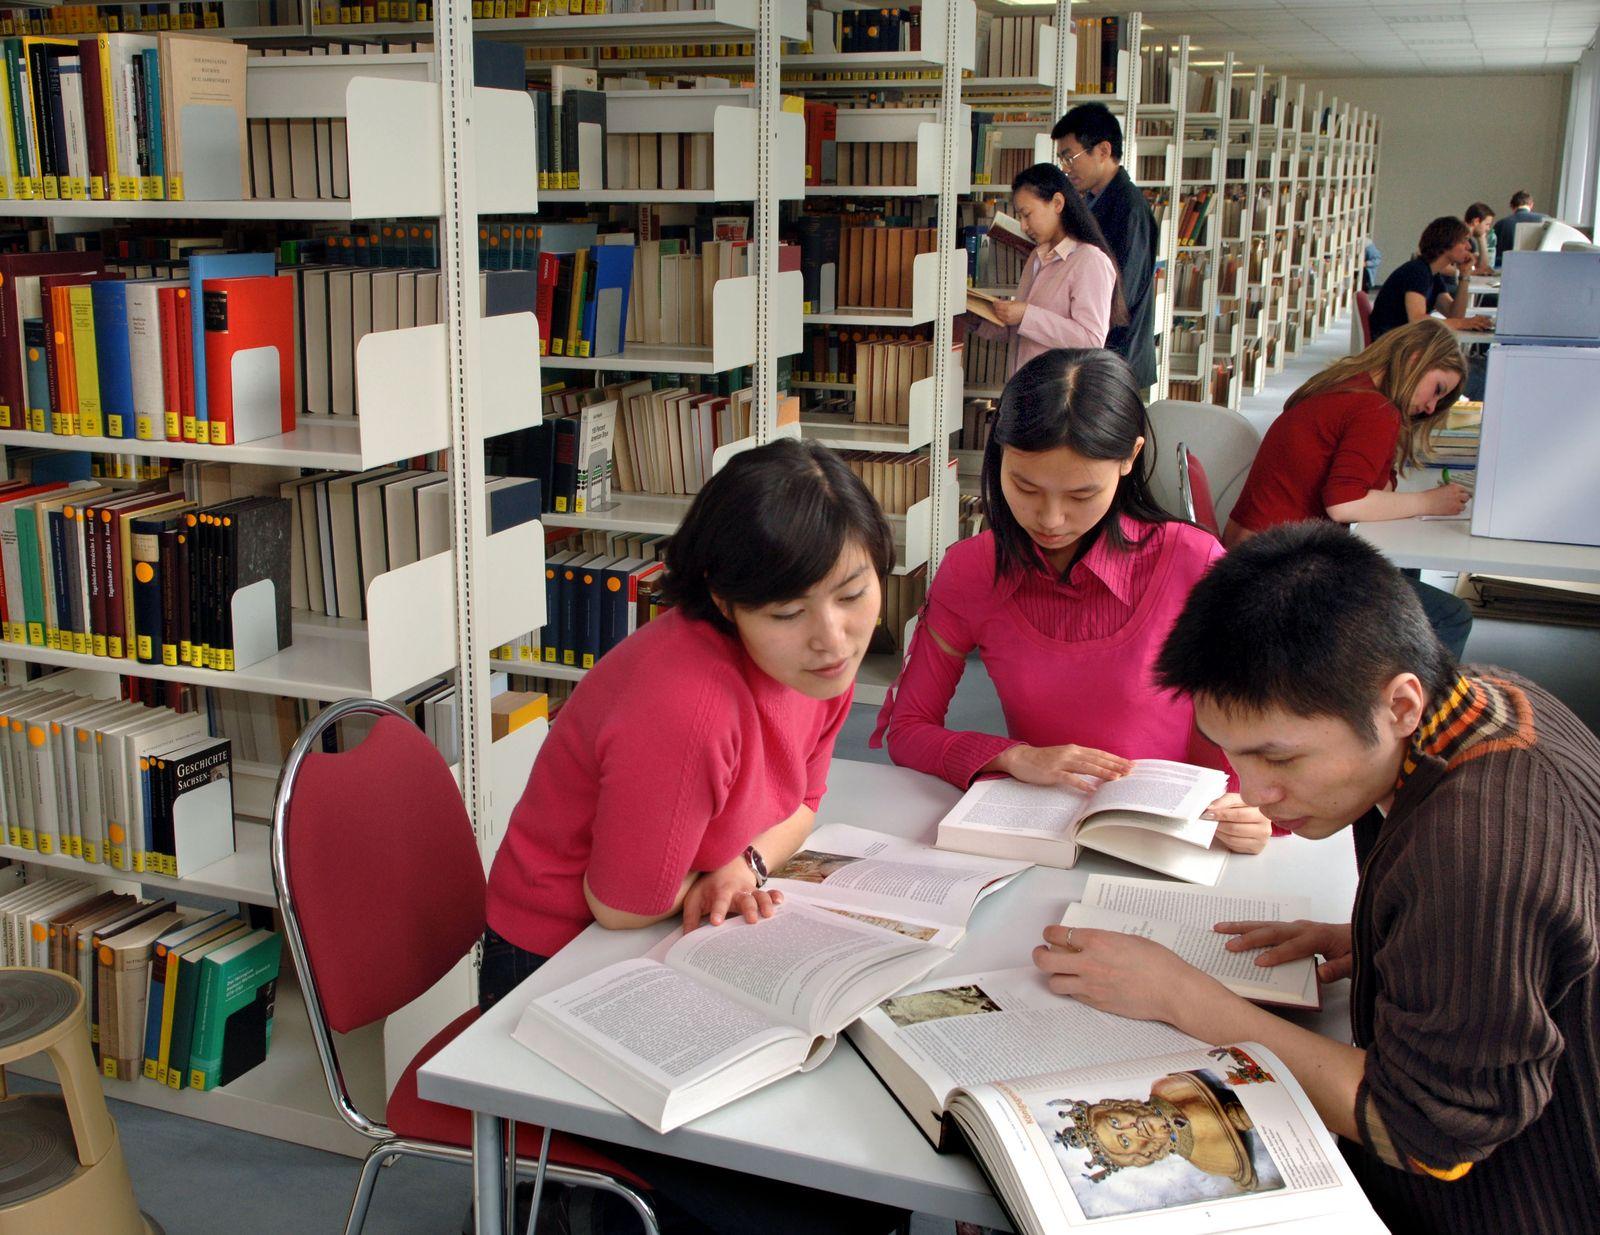 UniSPIEGEL/ Asiatische Studenten